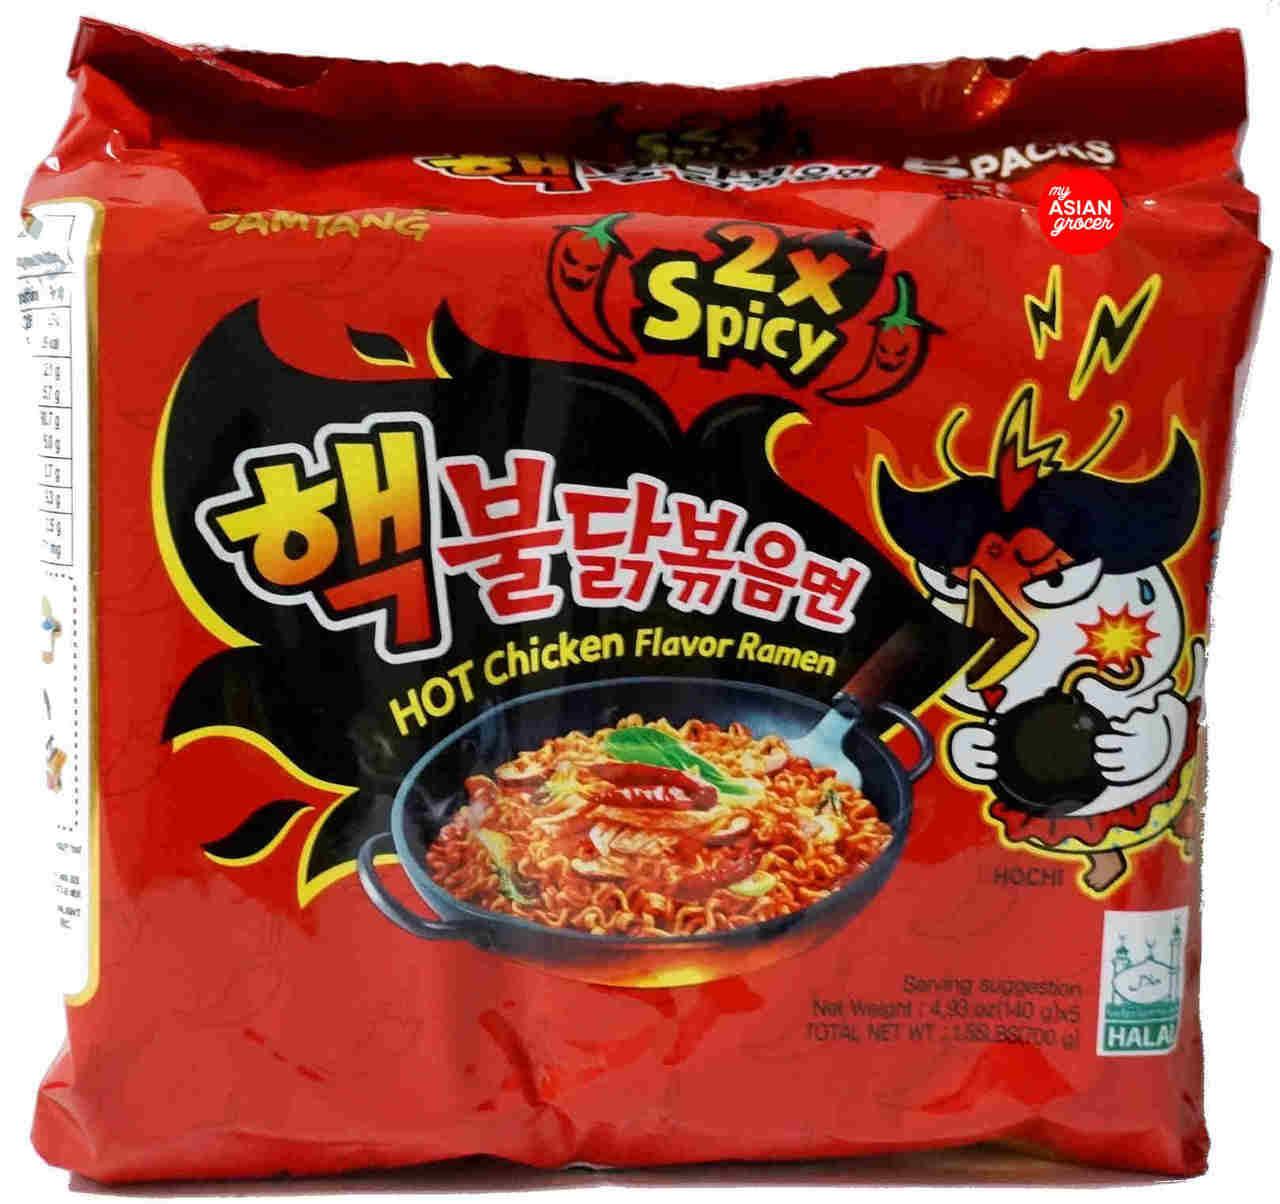 Samyang Hot Chicken